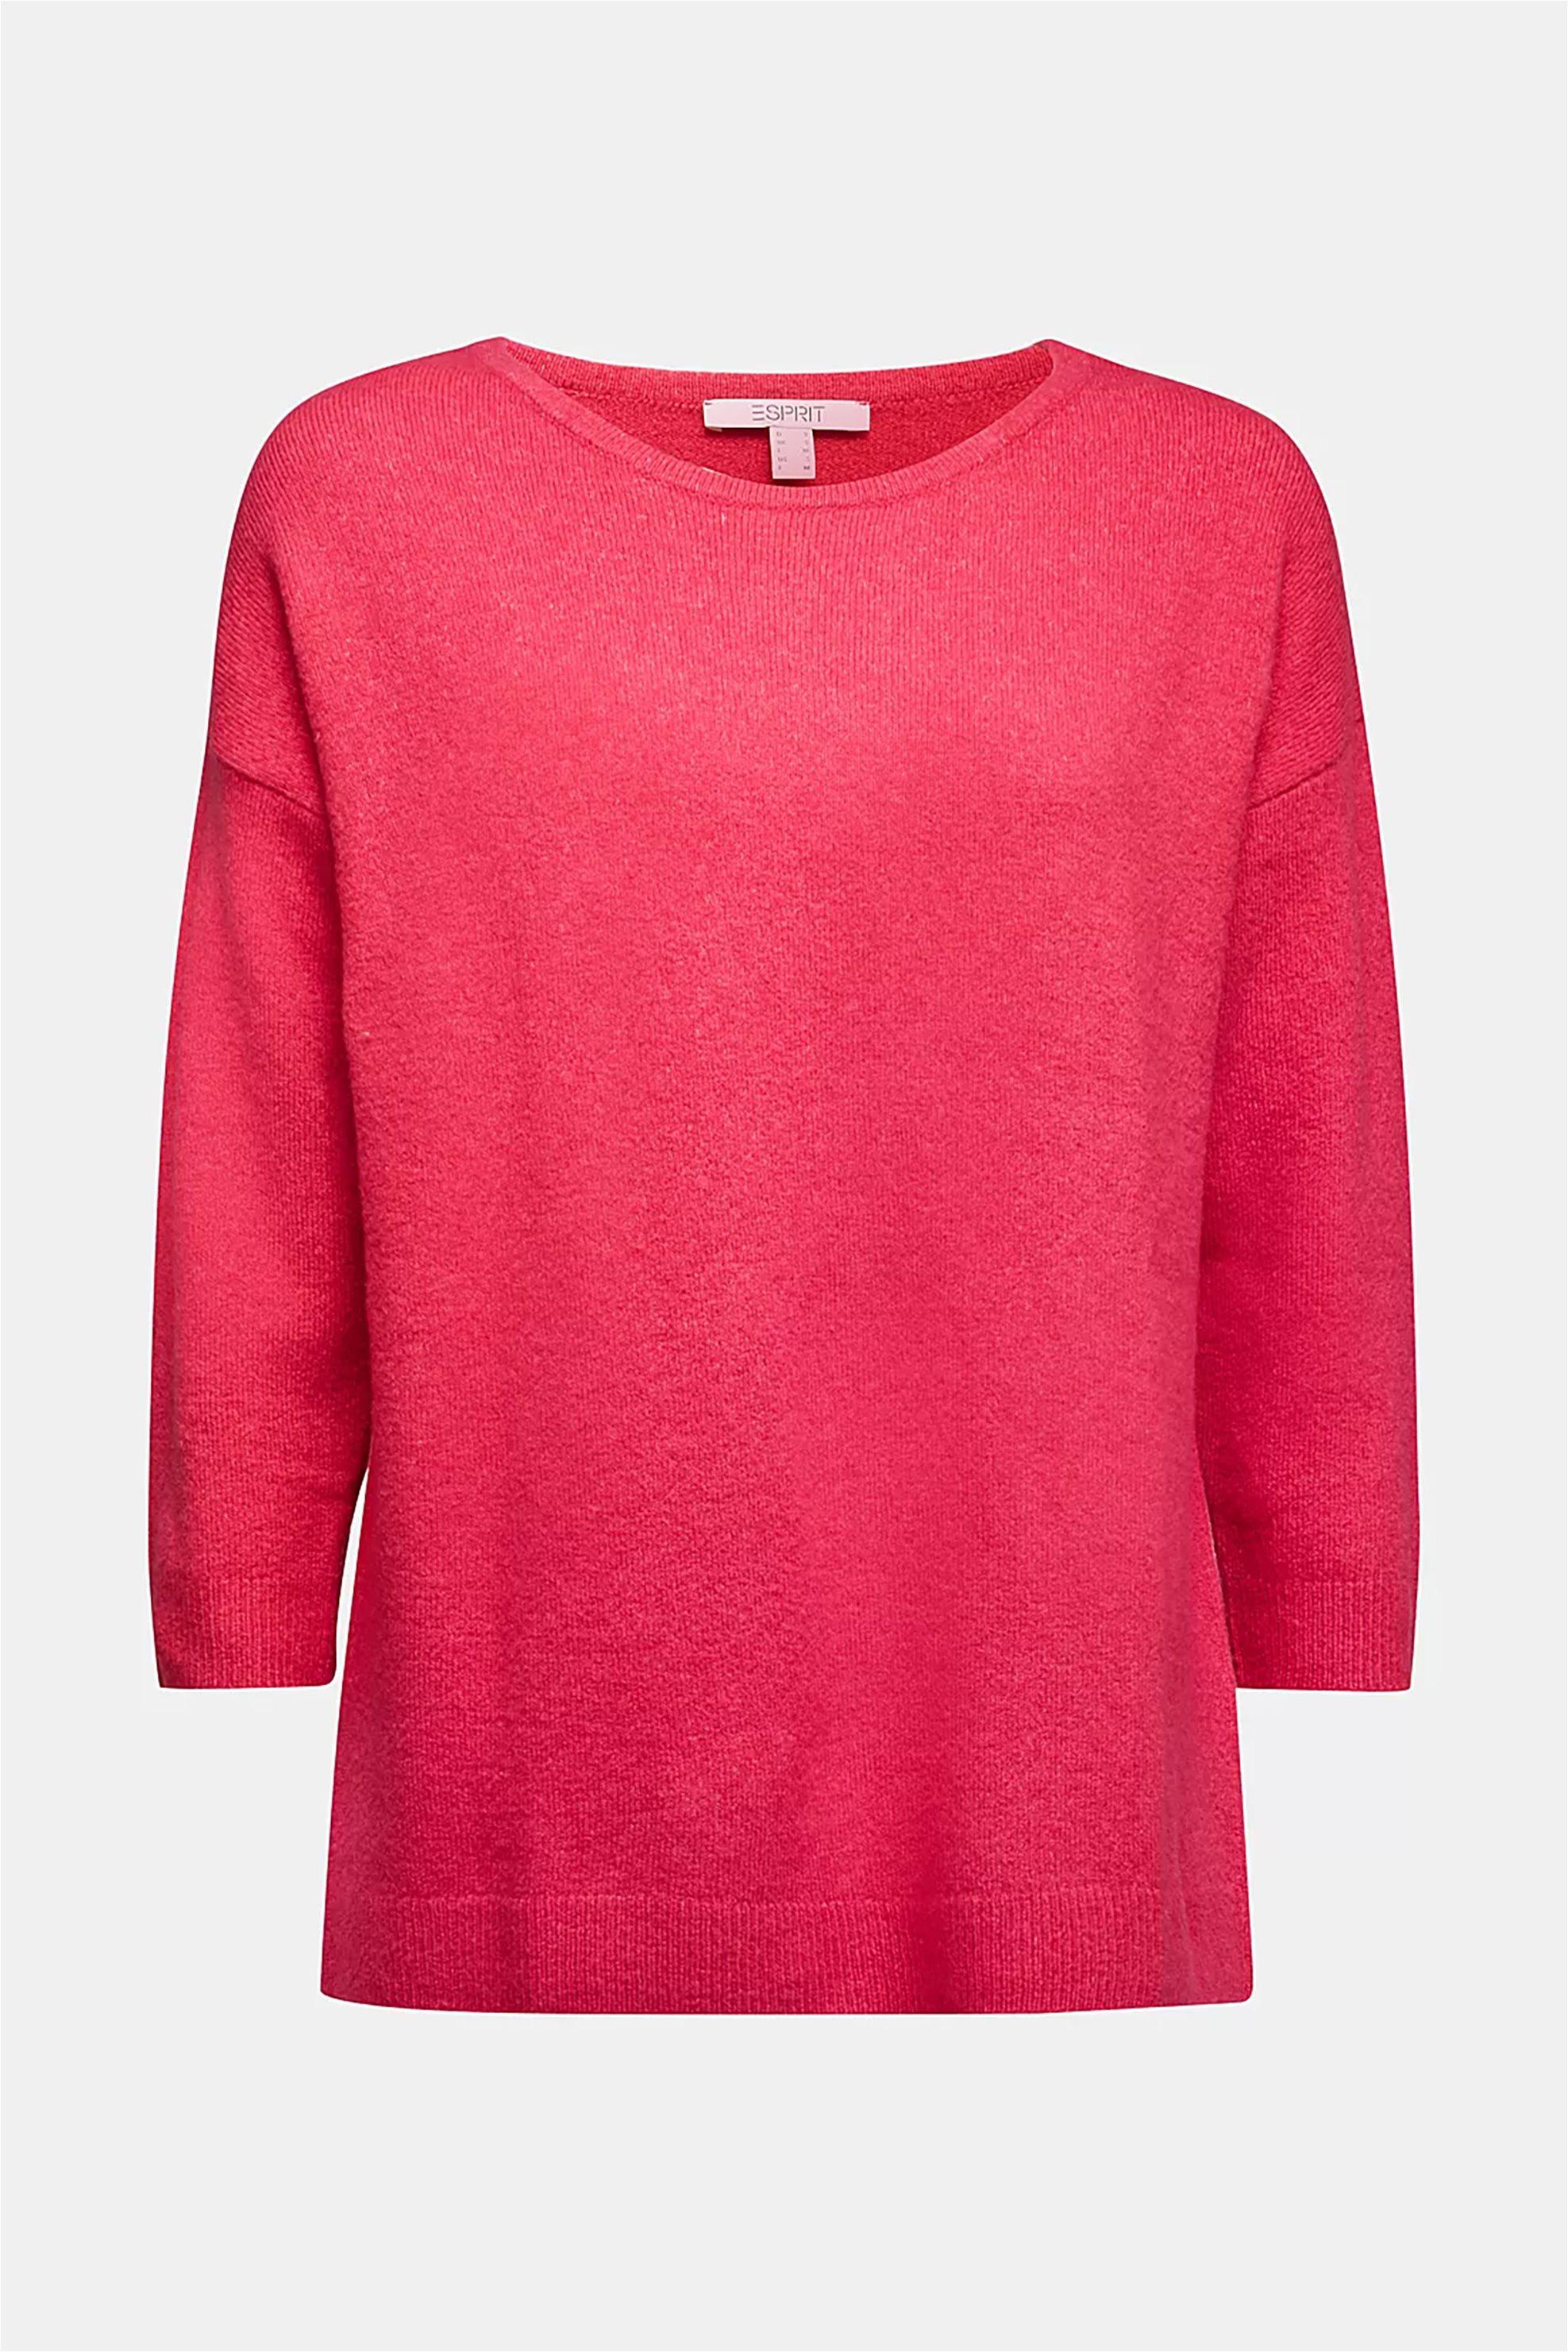 Esprit γυναικεία πλεκτή μπλούζα μονόχρωμη με στρογγυλή λαιμόκοψη - 080EE1I327 - Φούξια